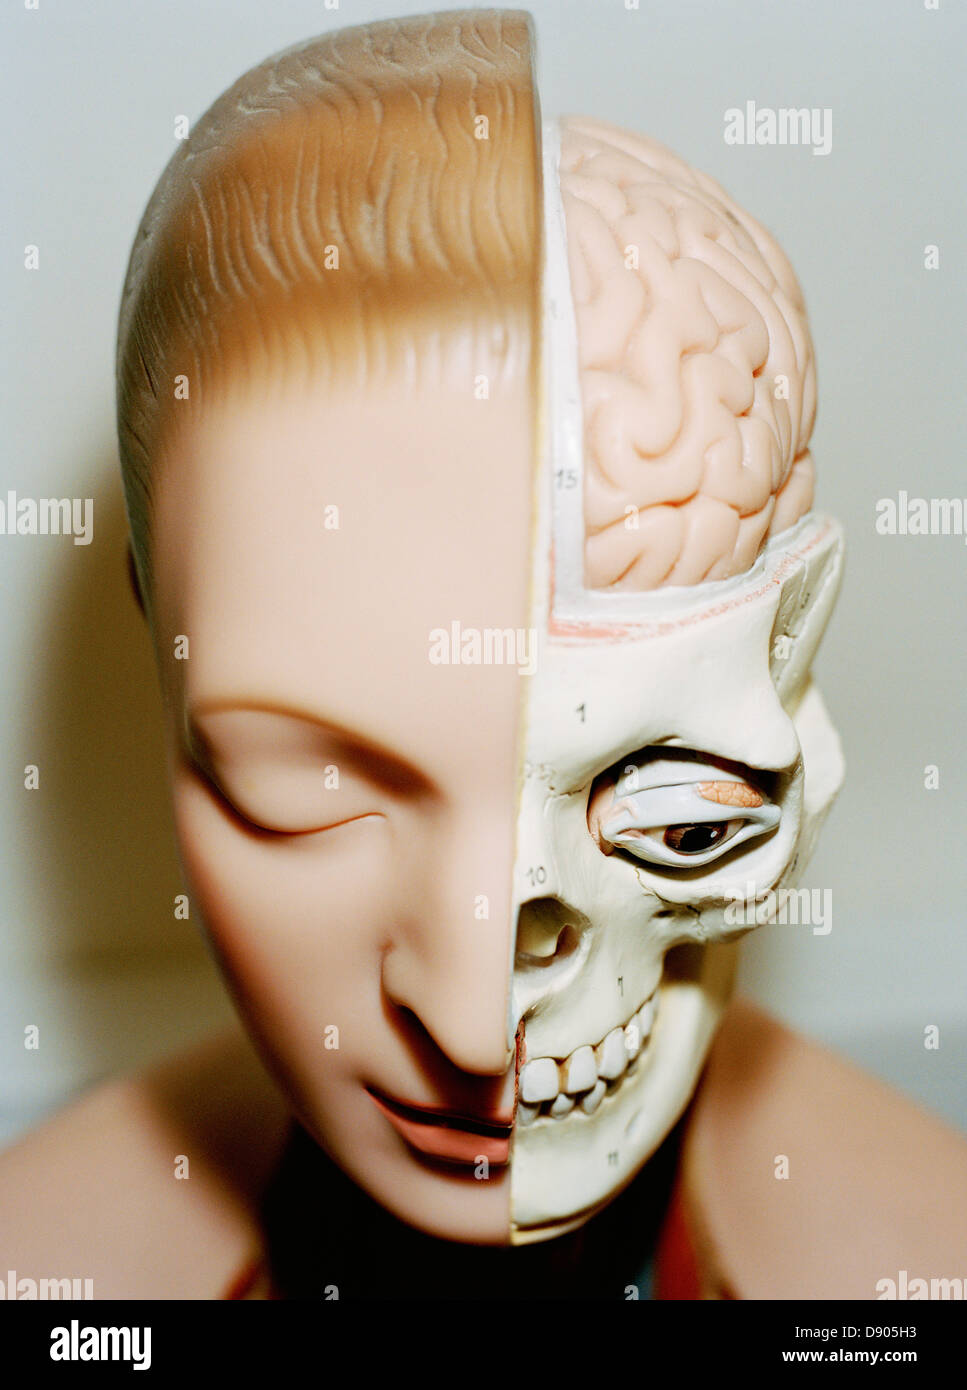 An anatomy model. - Stock Image